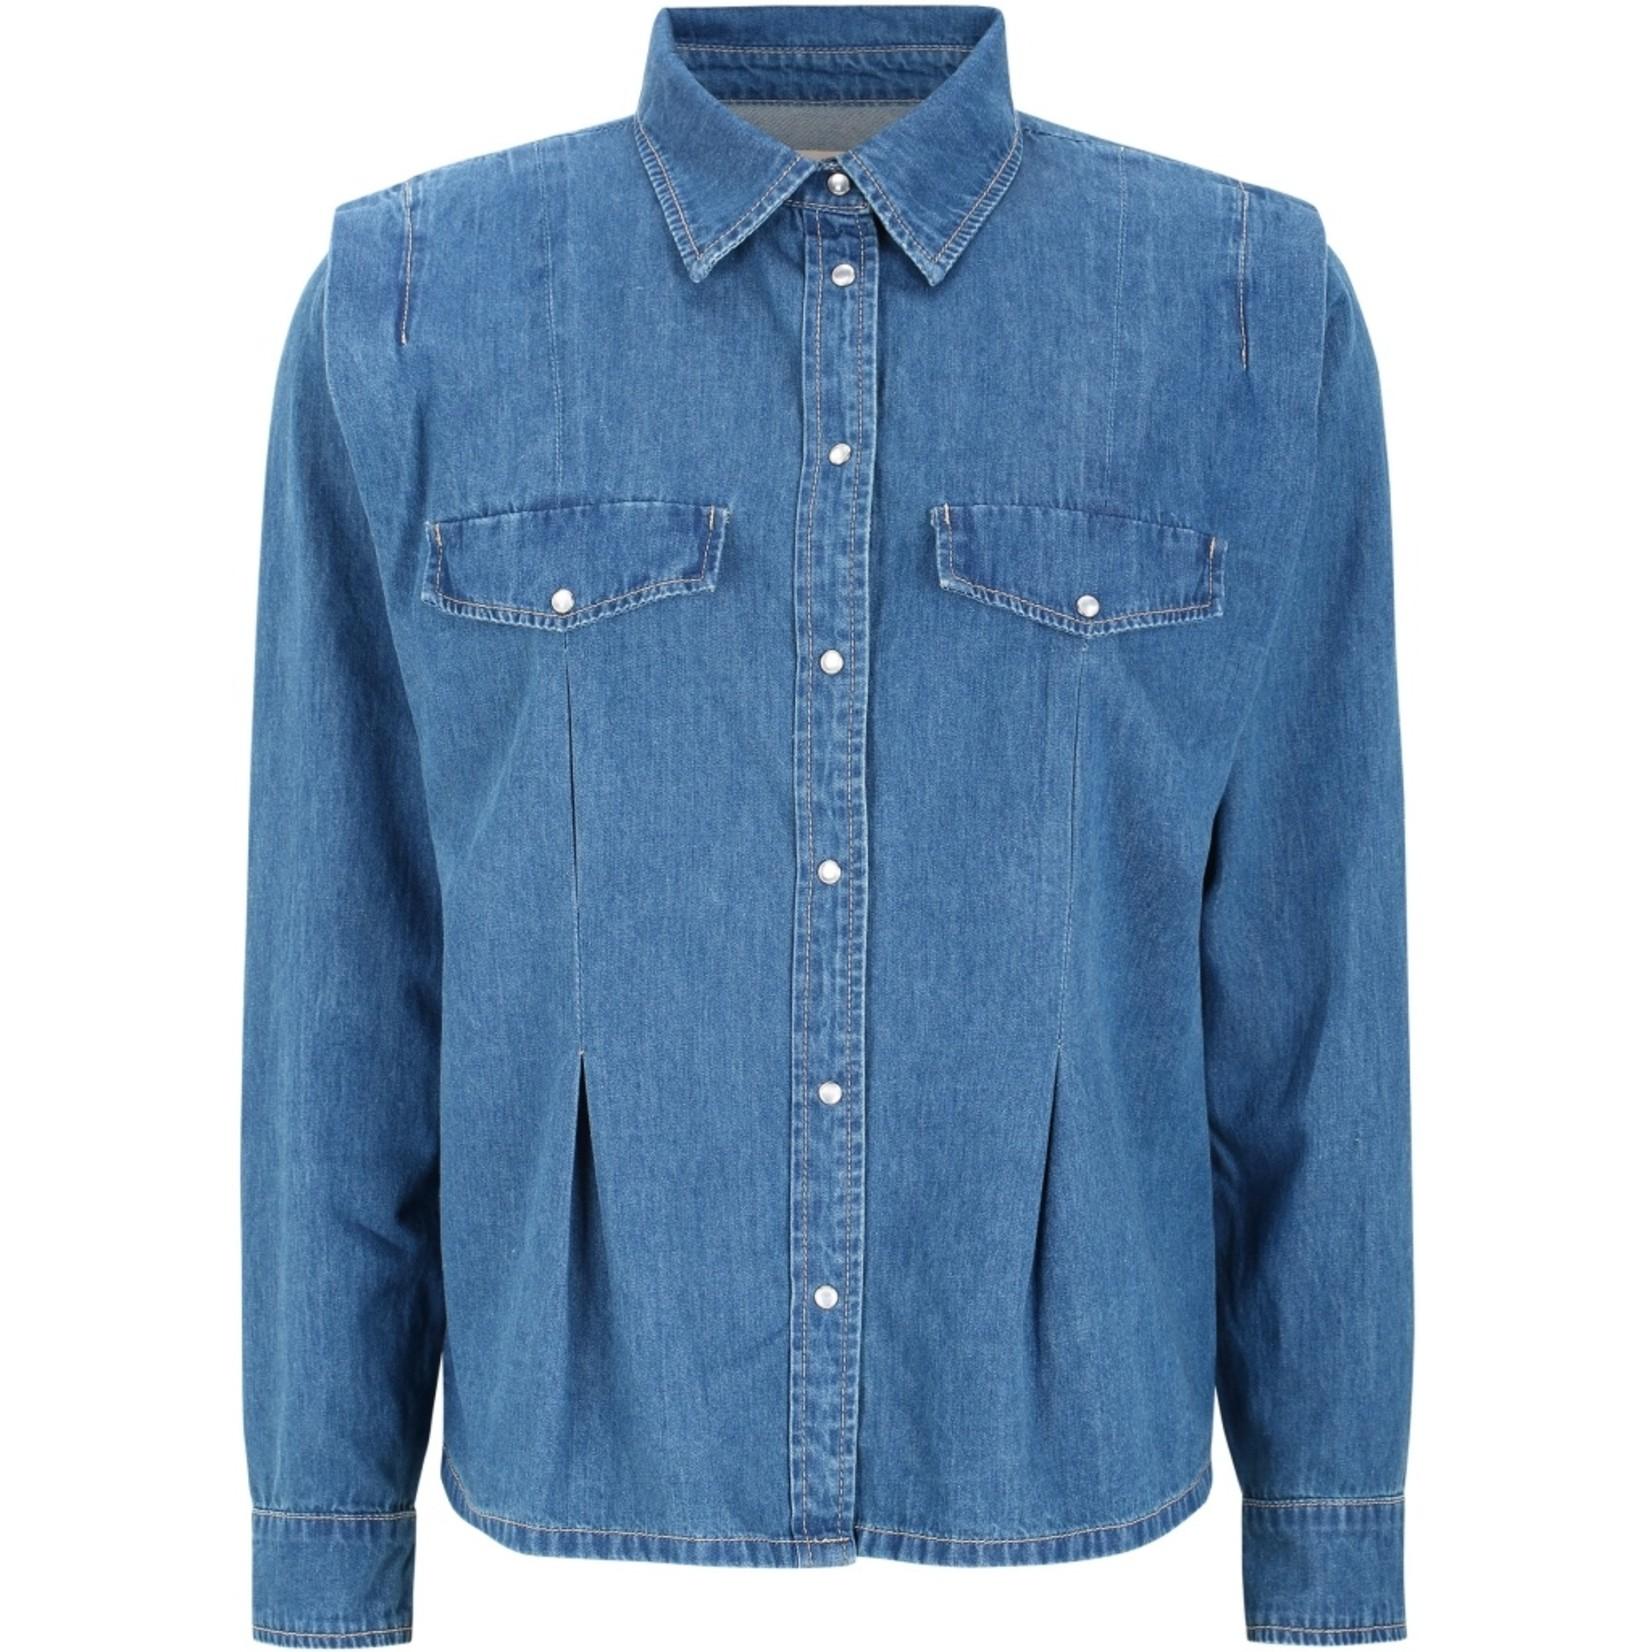 SOFT REBELS BLUEBELL LS SHIRT, spijker blouse